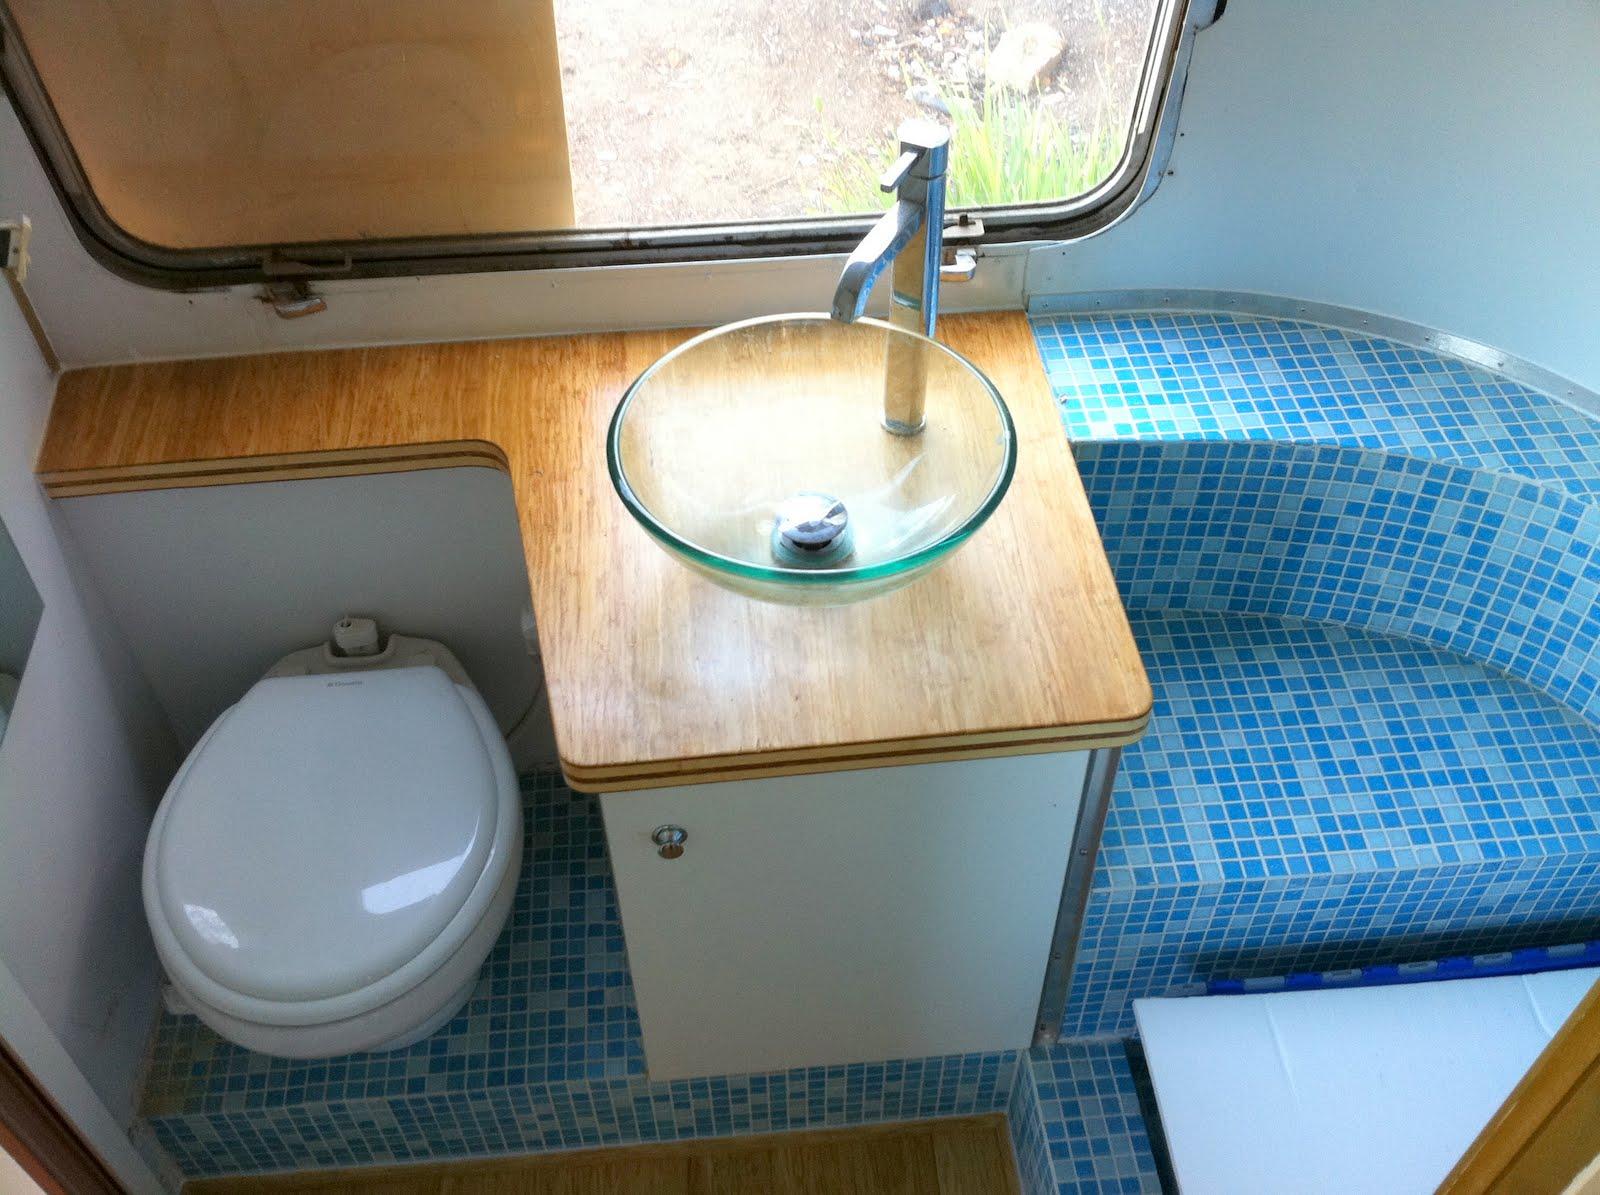 Buy El 20043 Bathroom Ceiling Light: An Architect's Airstream: The Bathroom